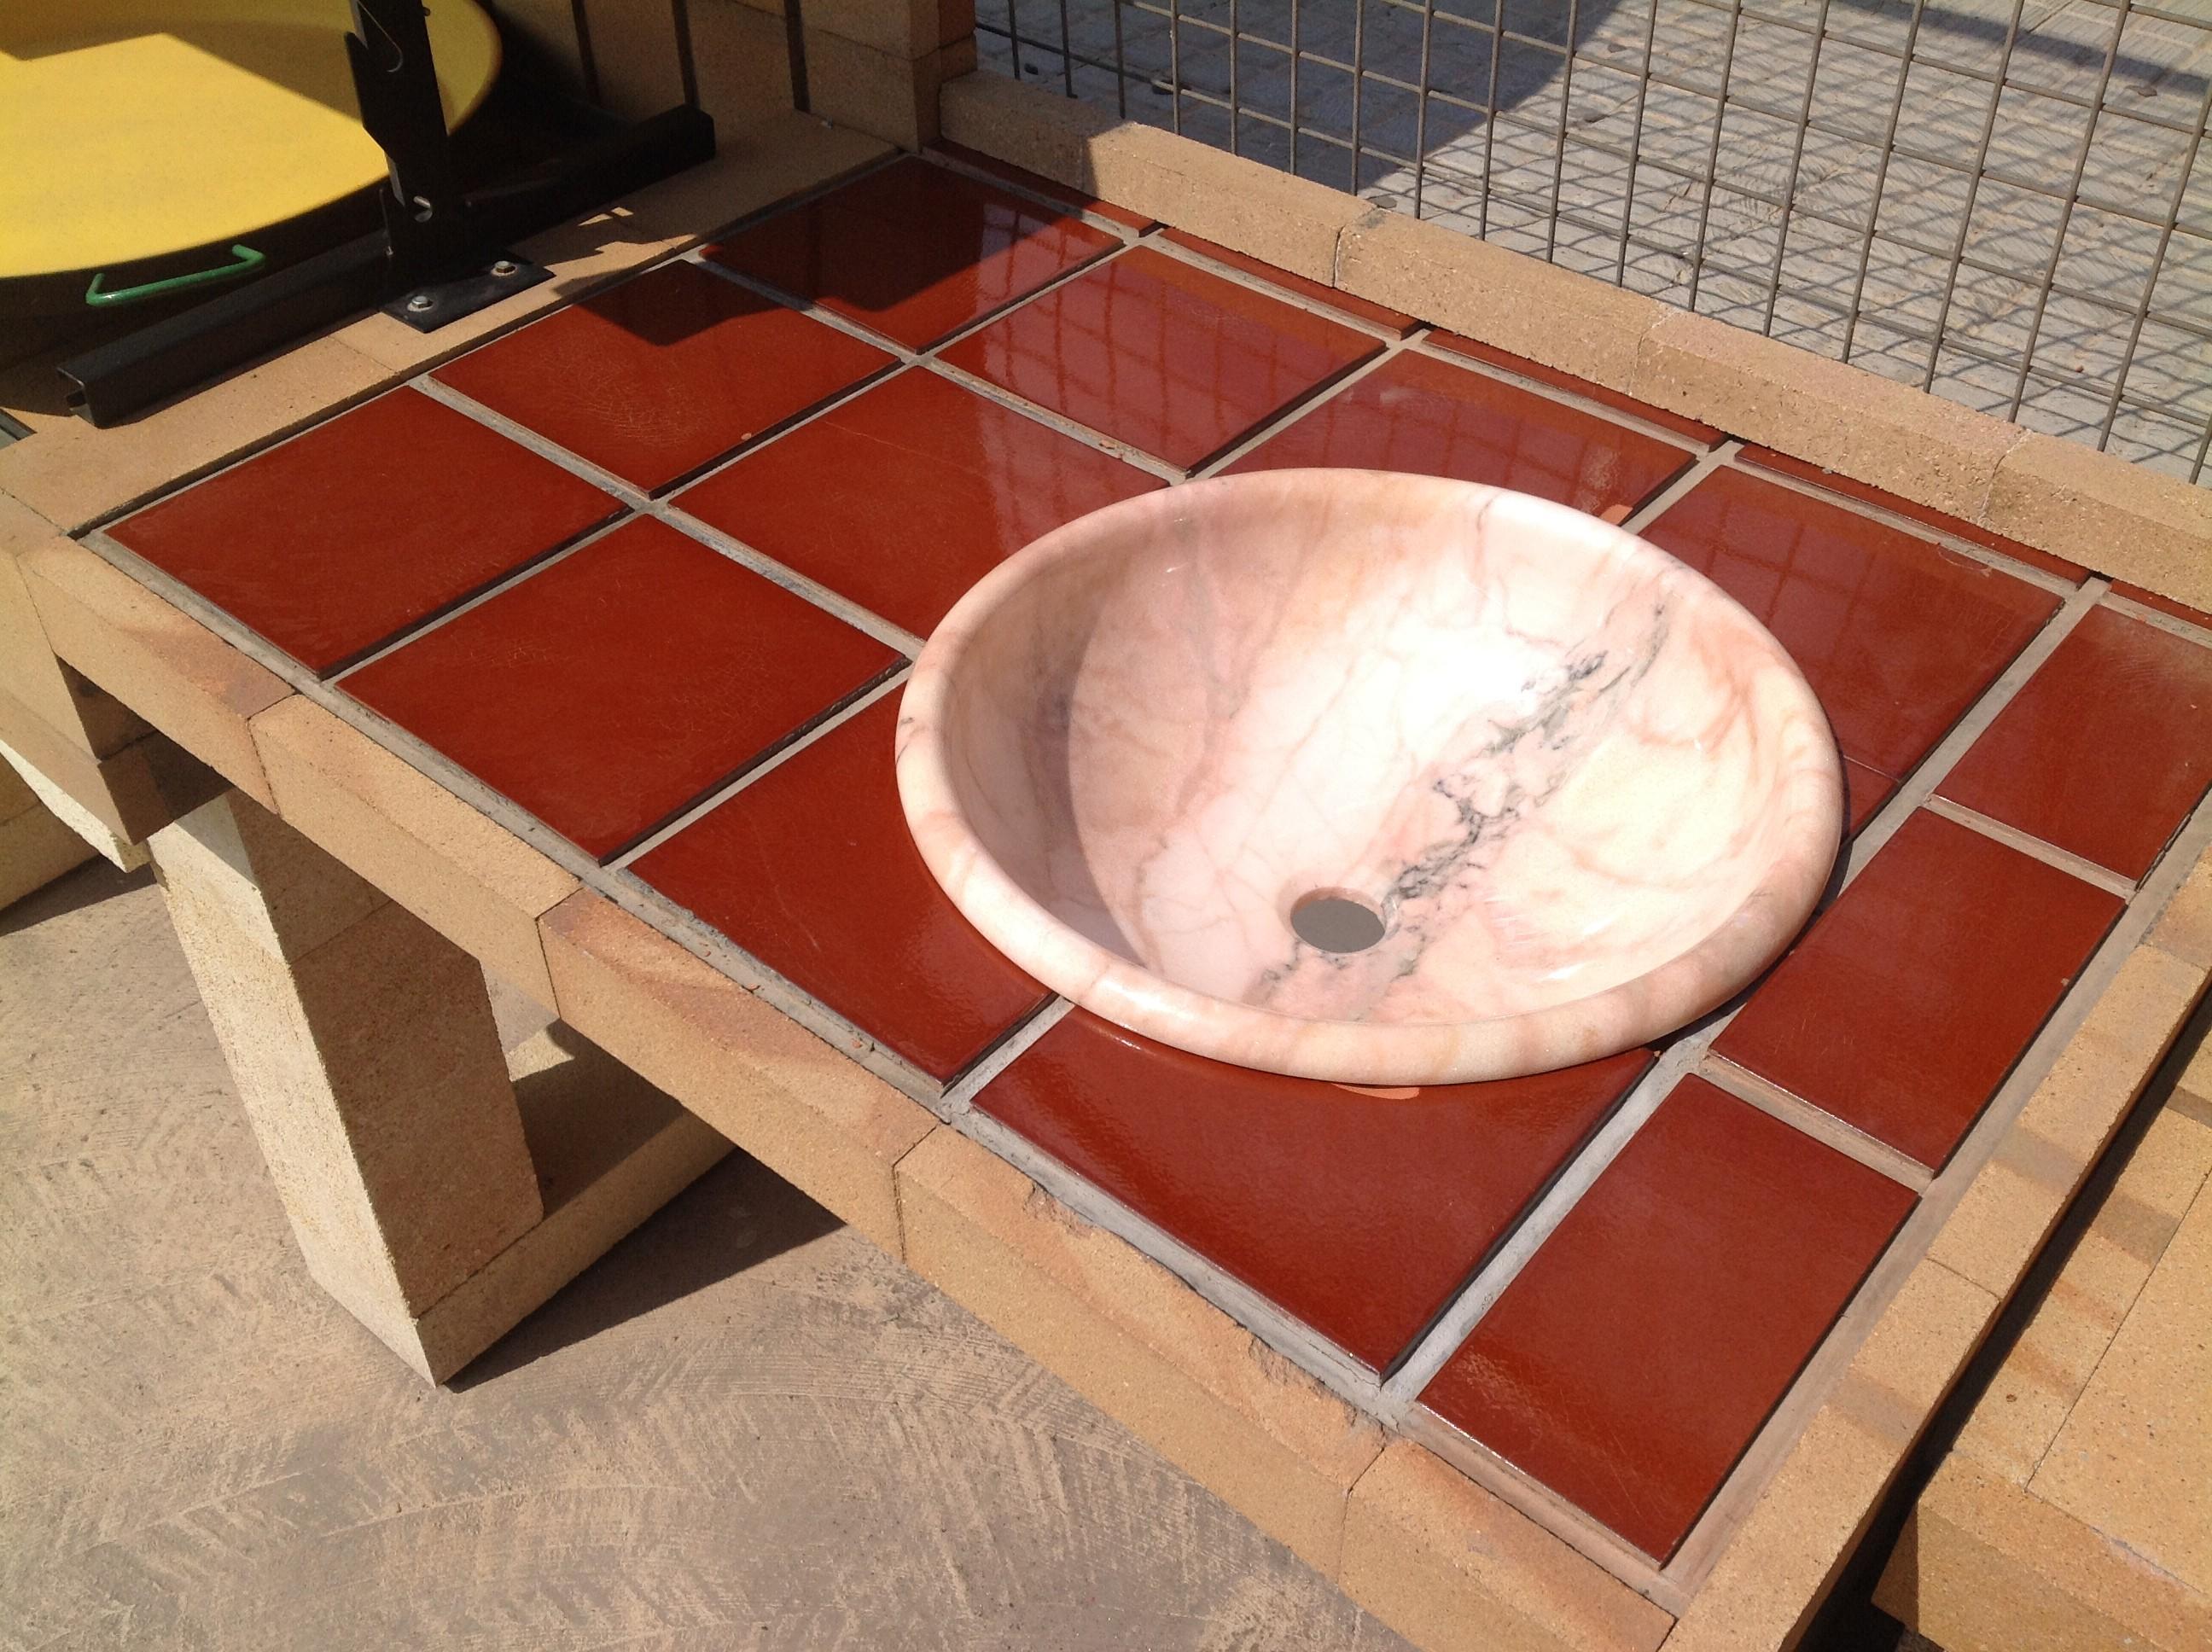 Detalle pila azulejo refractario chimeneas s nchez - Azulejos refractarios ...